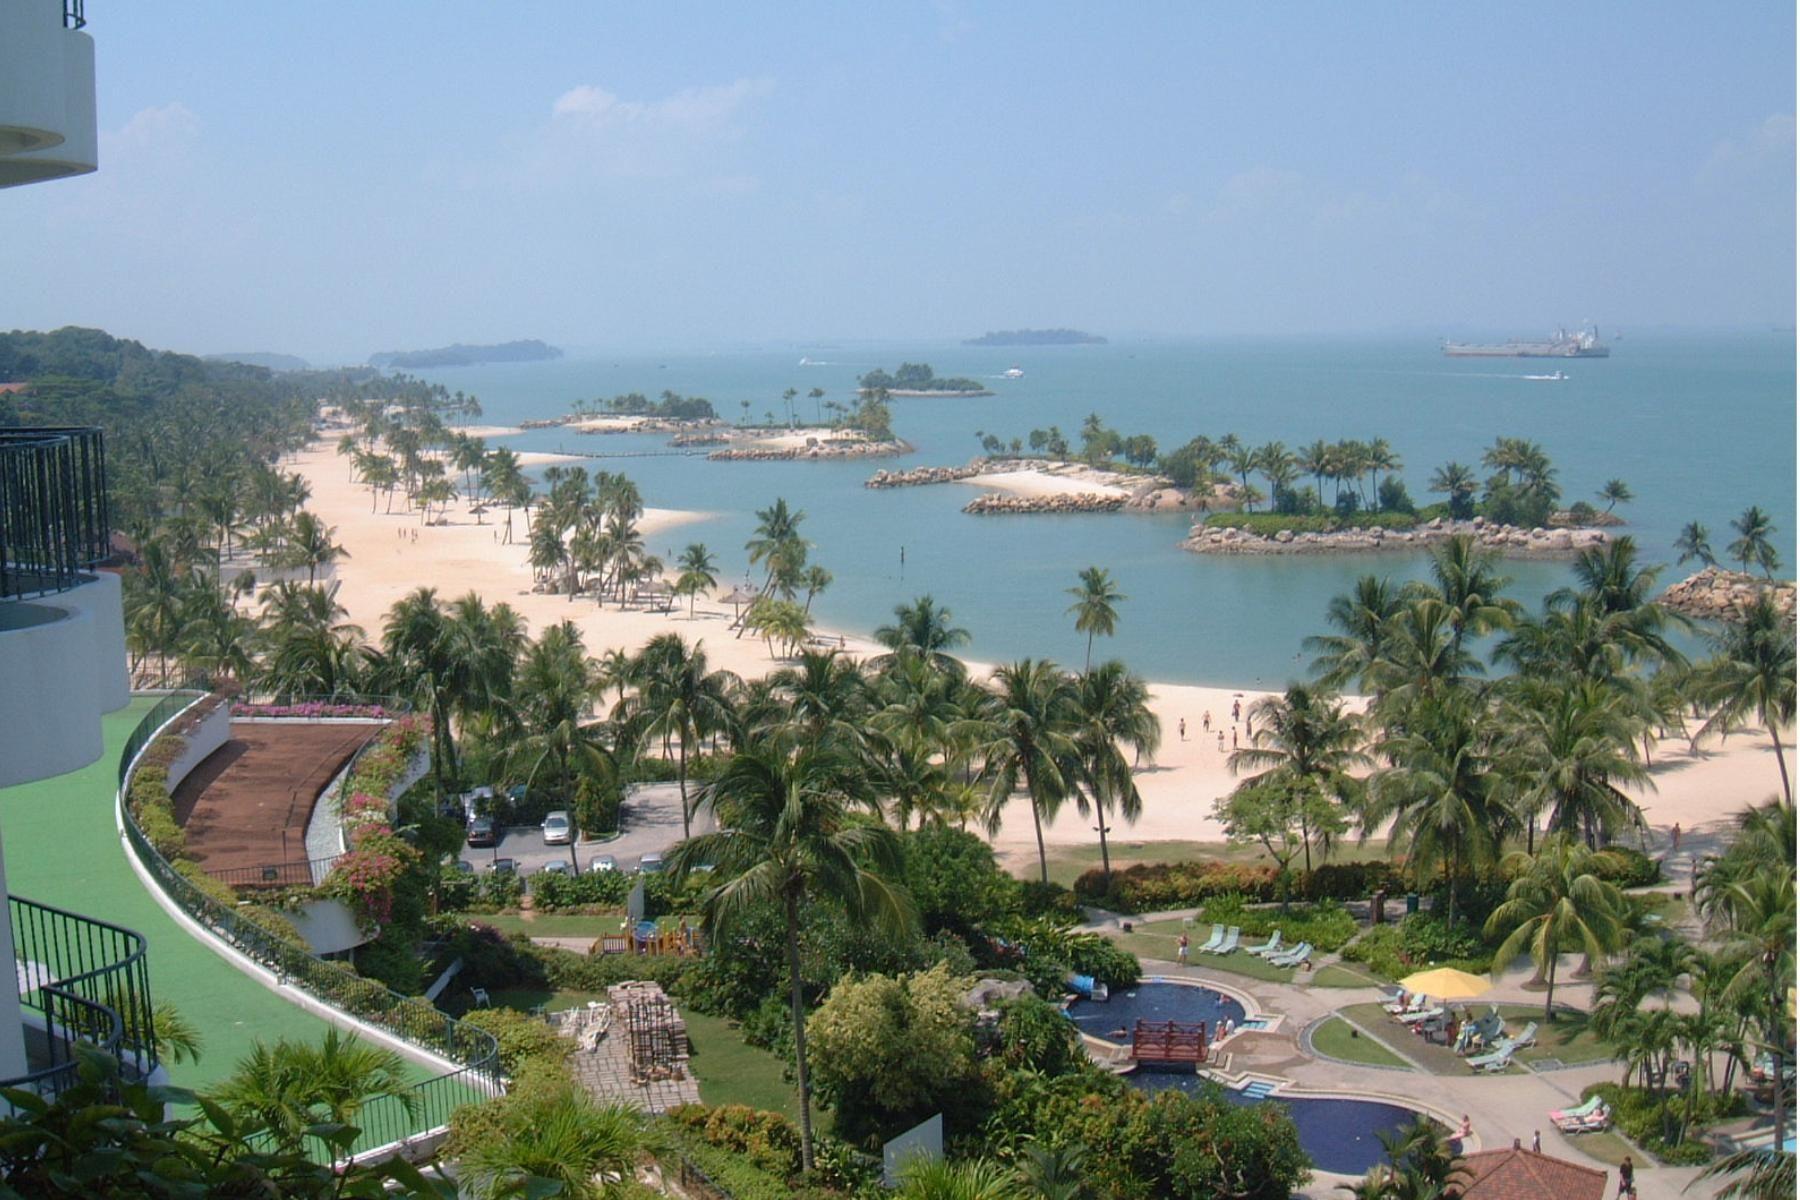 Sentosa Island Singapore Hd Travel Photos And Wallpapers Sentosa Island Singapore Overseas Travel Travel Photos